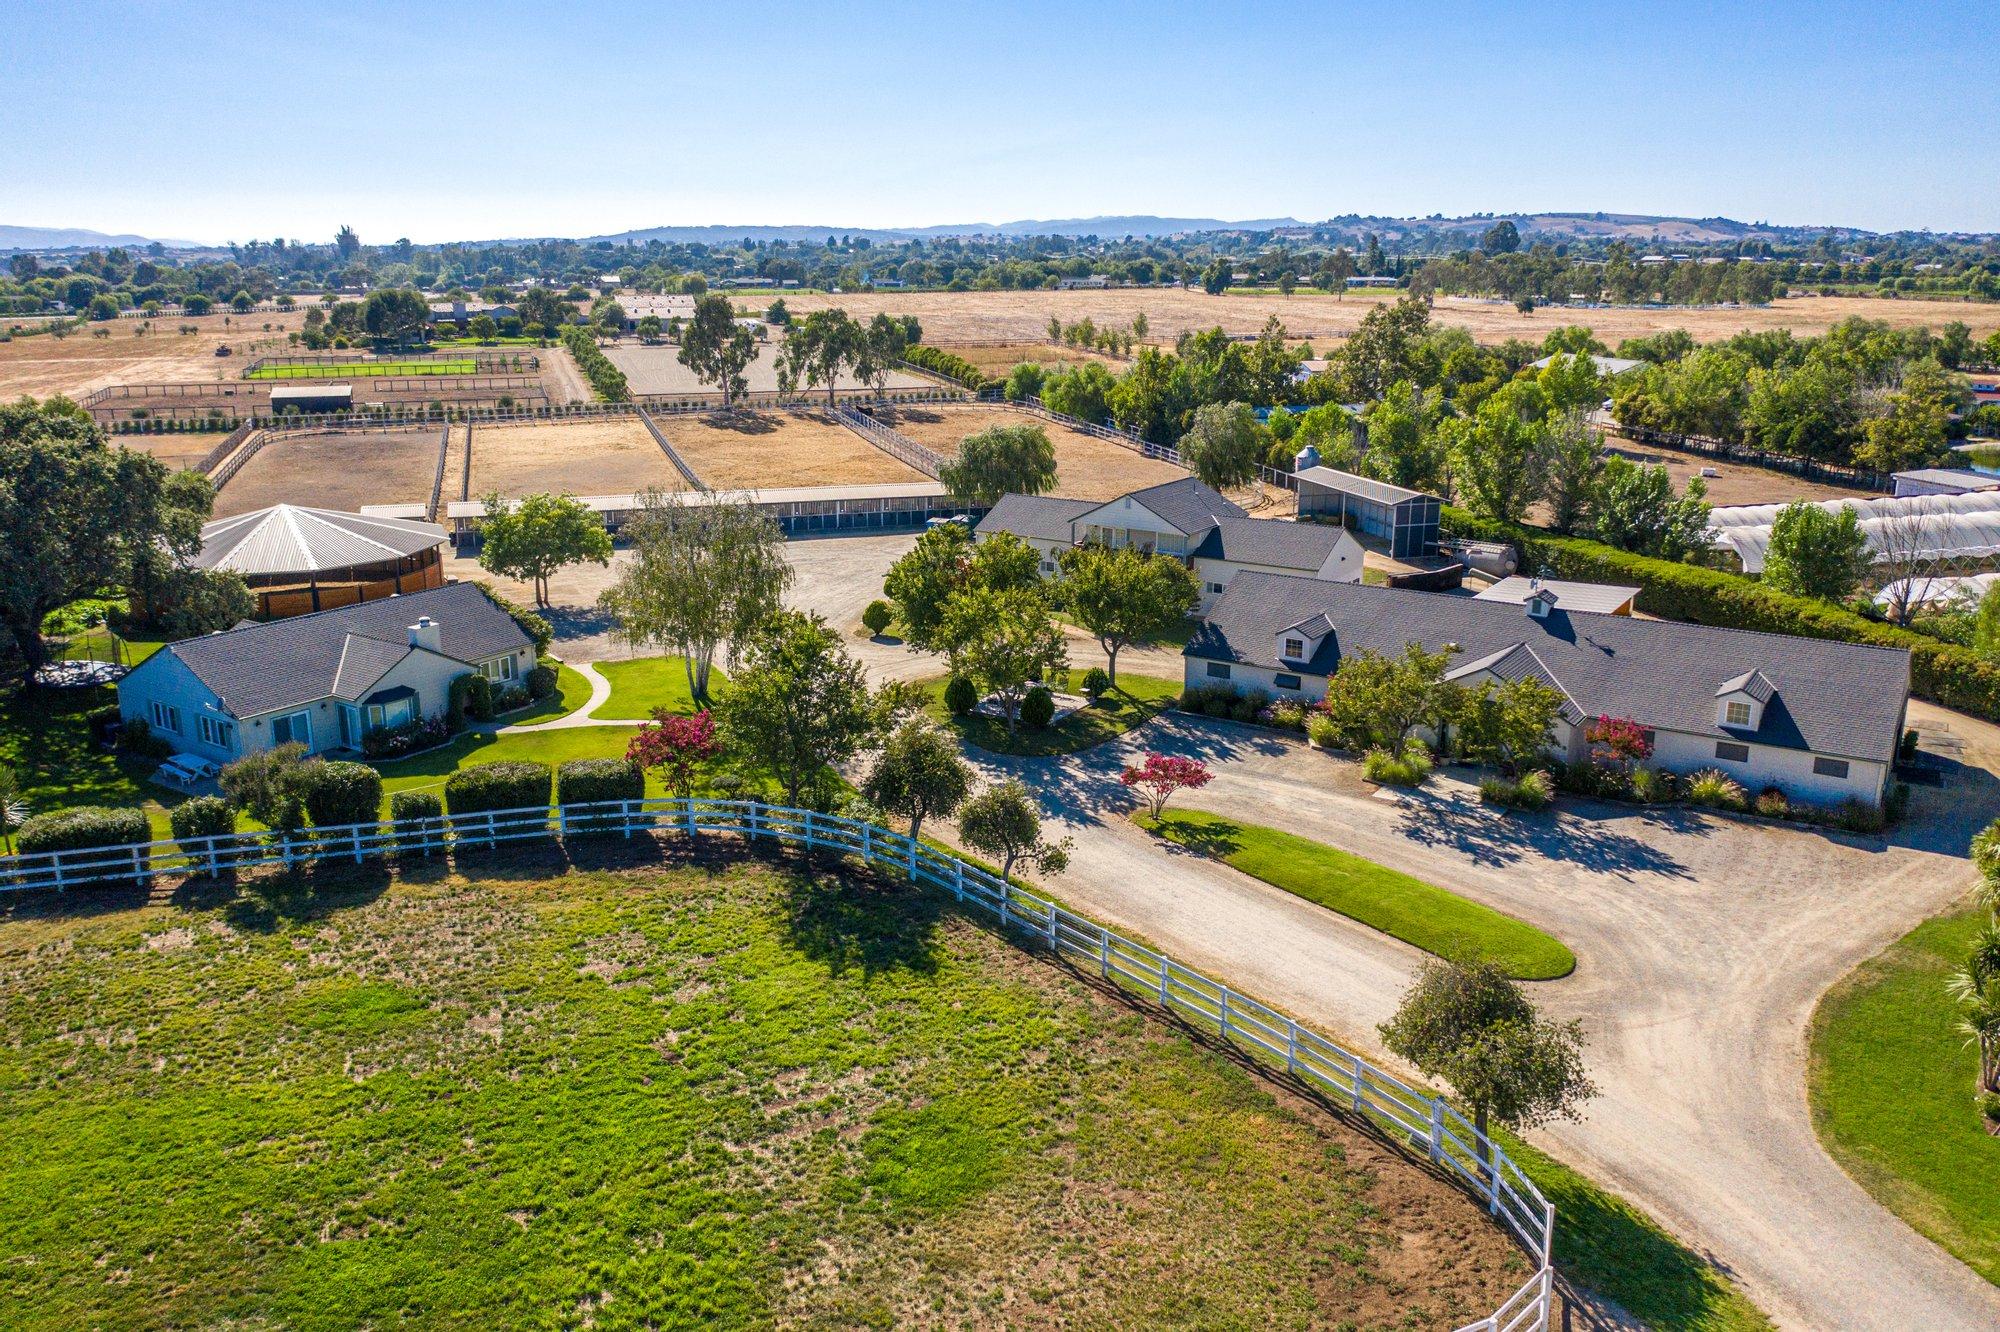 Santa Ynez, California, United States 1